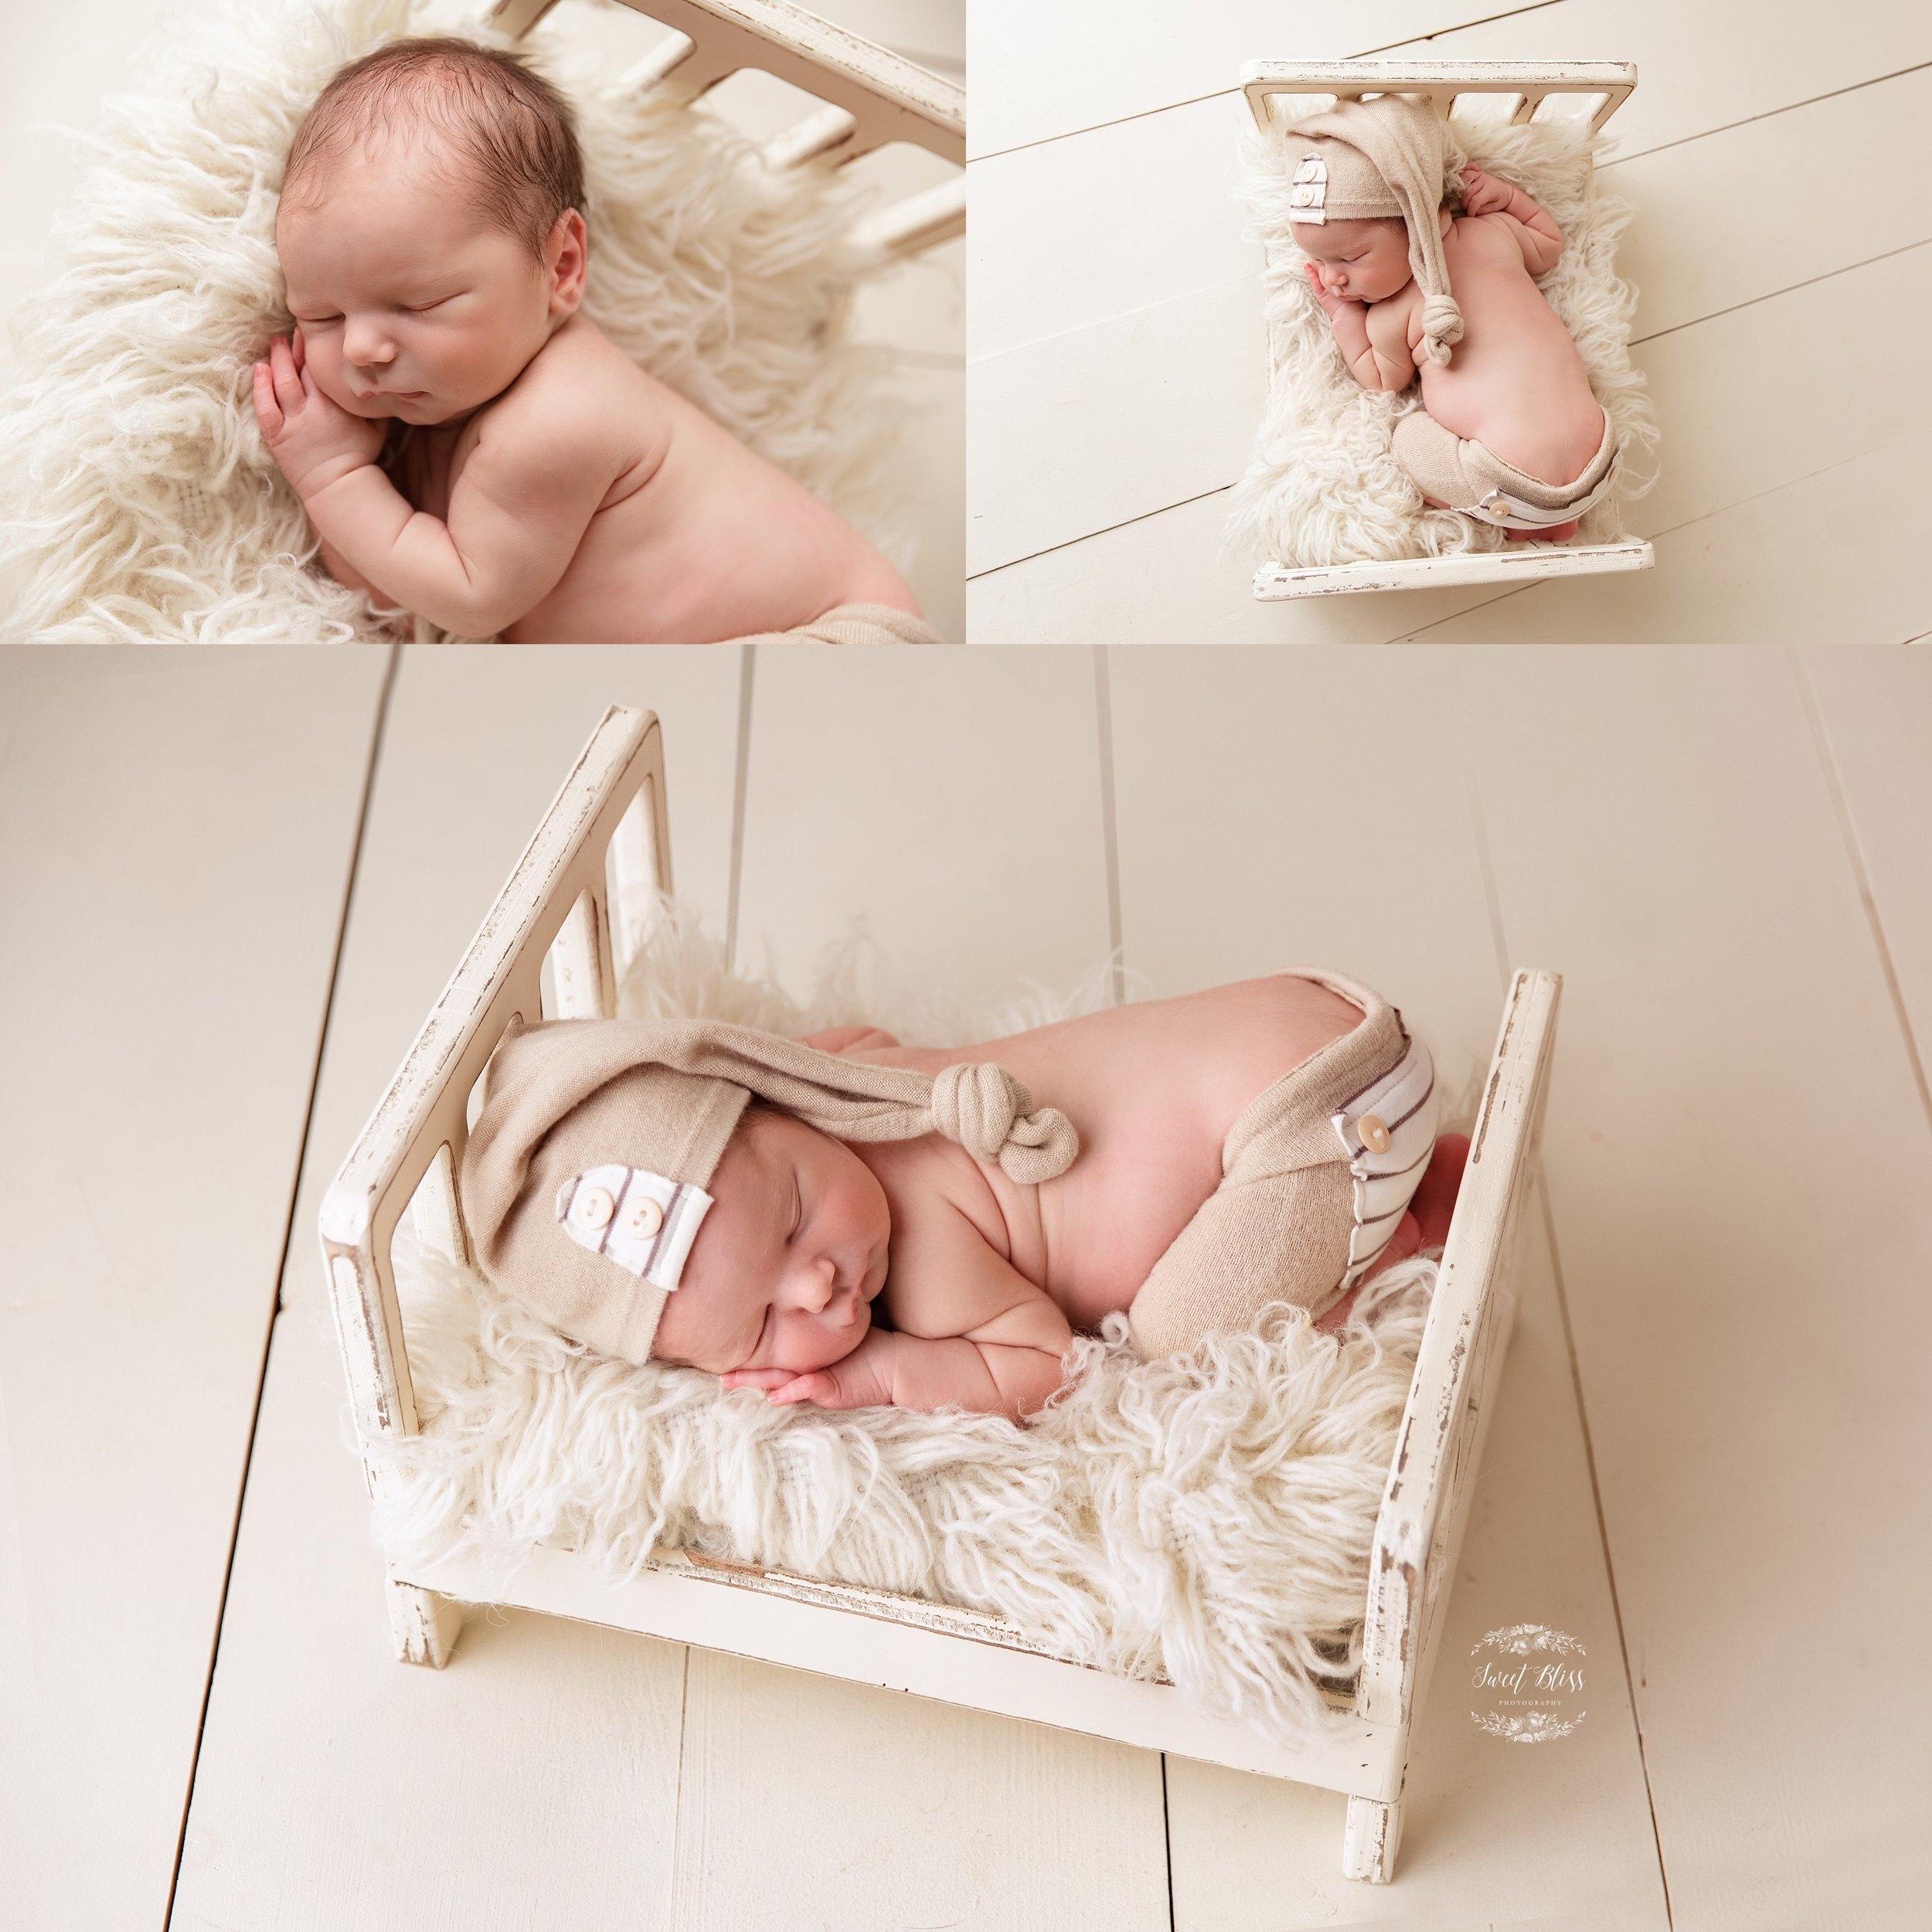 sweetblissphotography_bed_newbornboy2.jpg